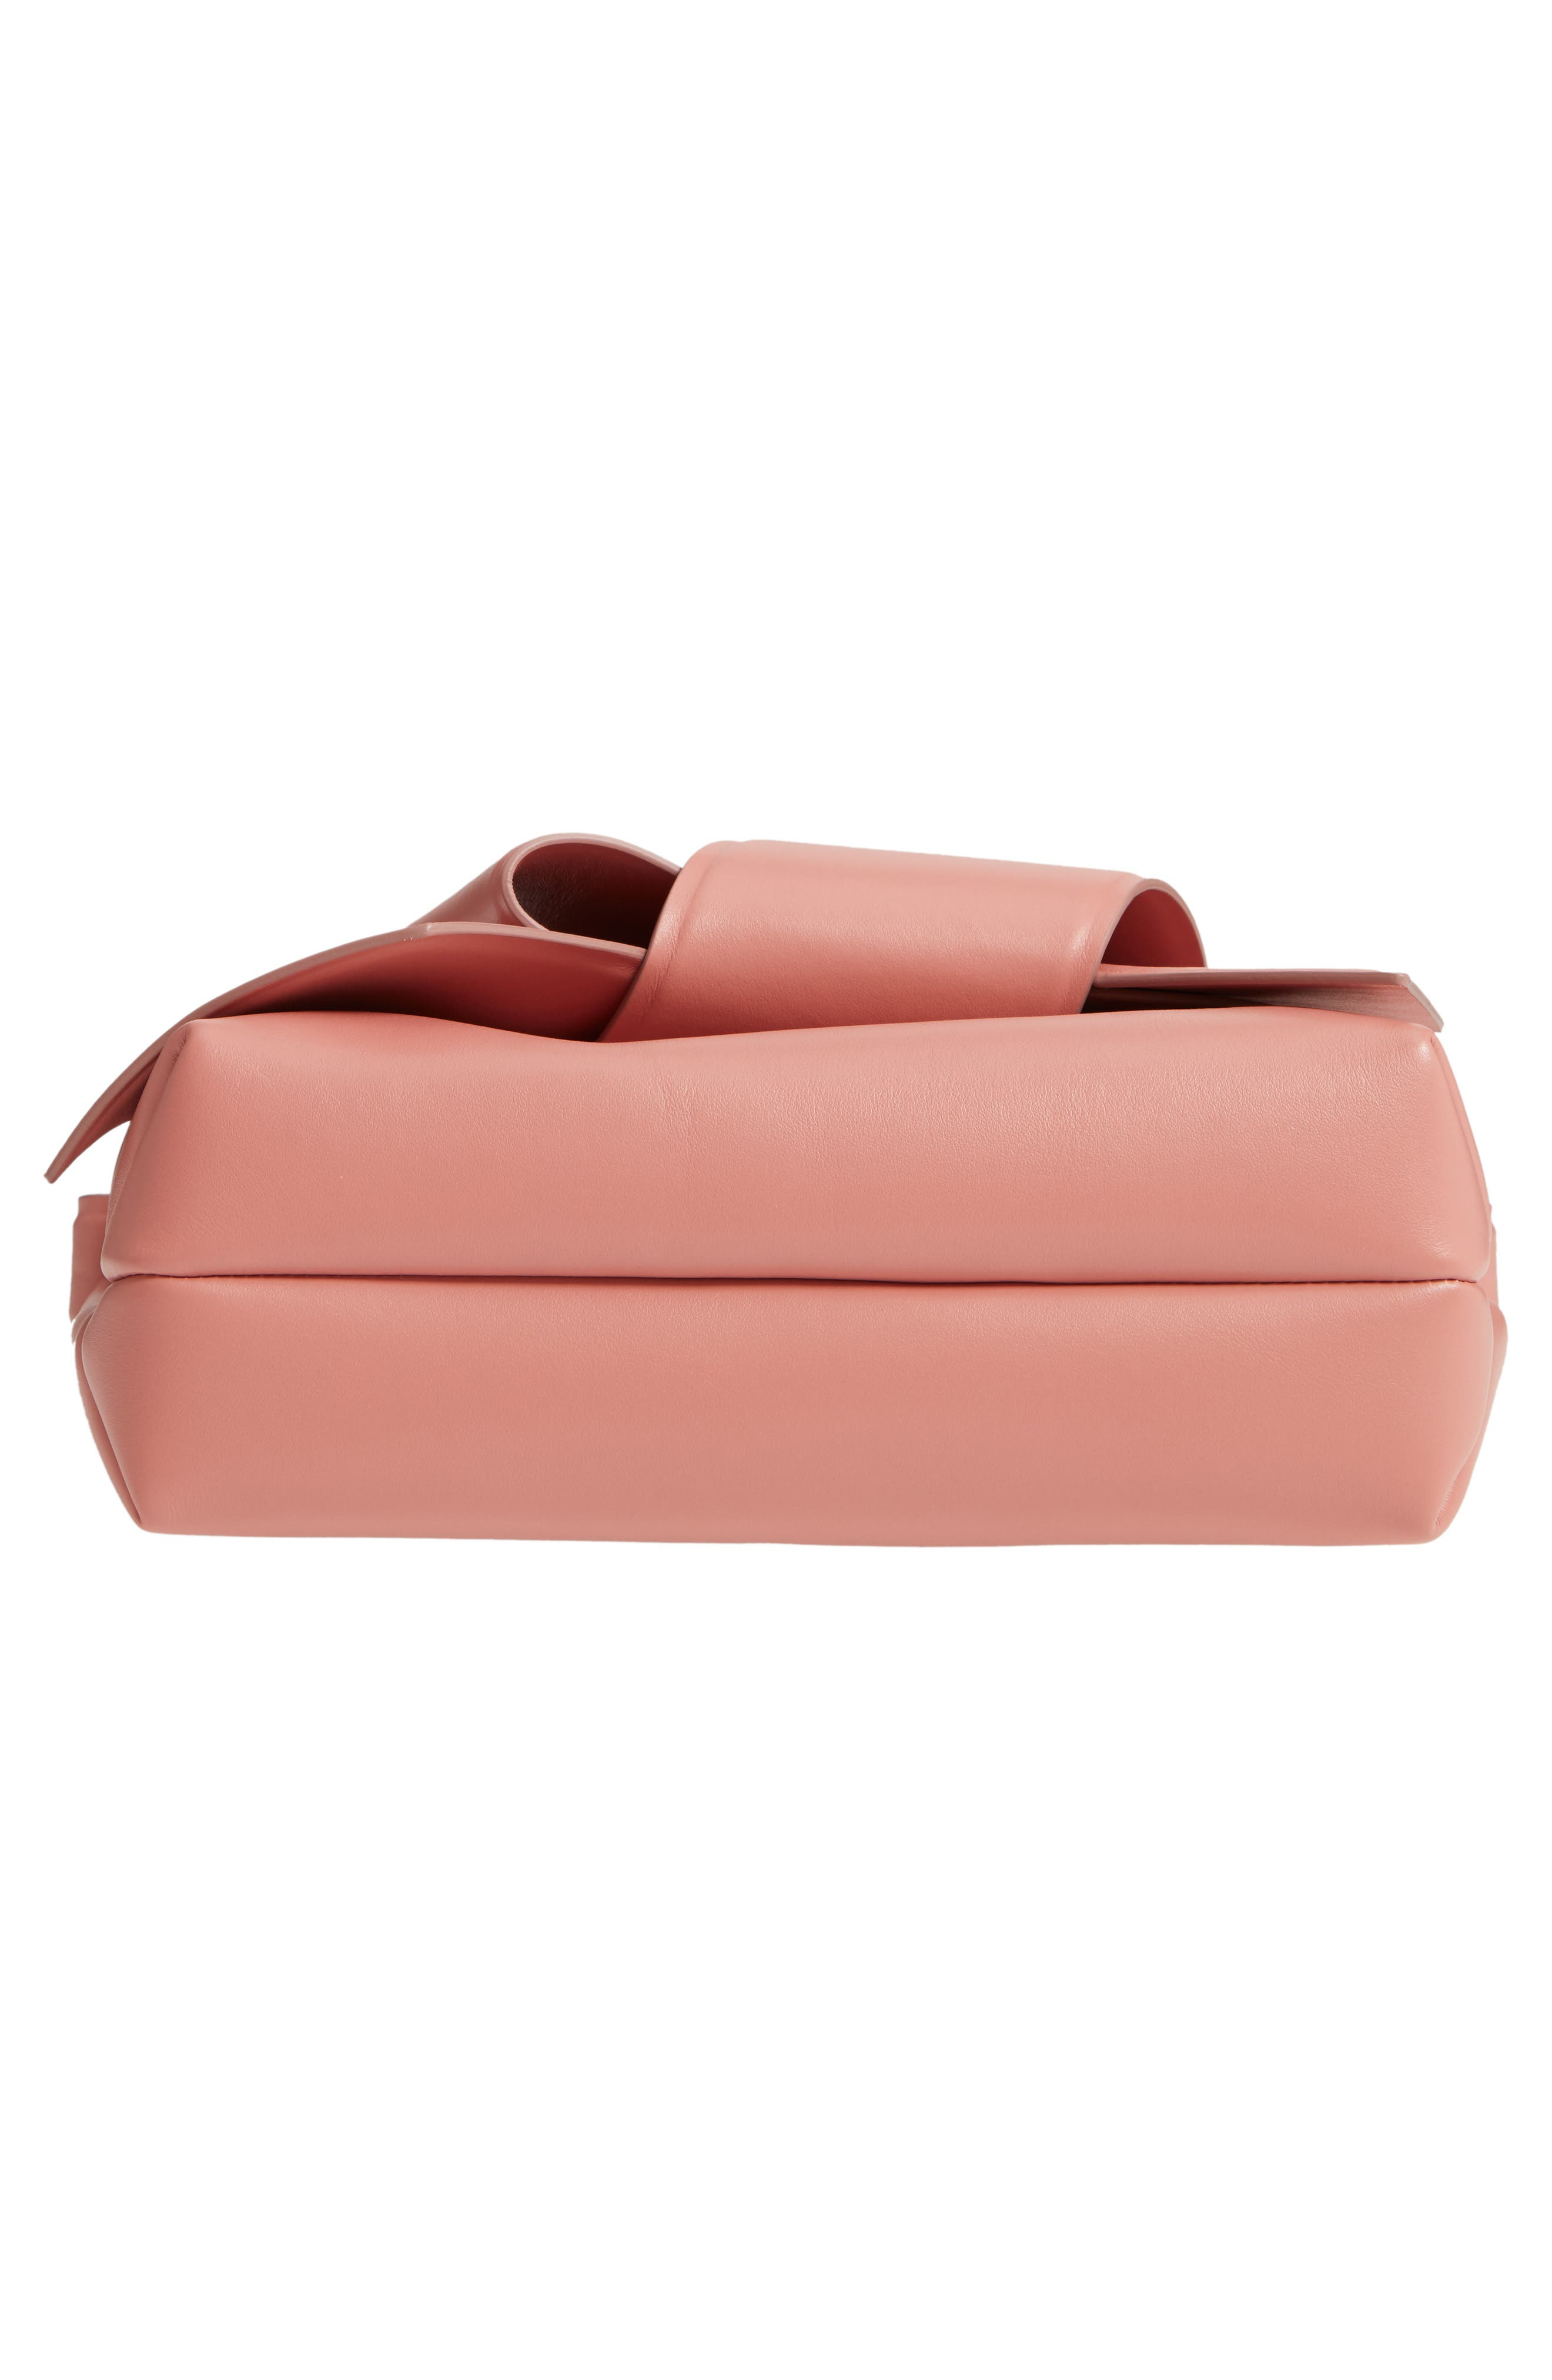 Musubi Knot Leather Handbag,                             Alternate thumbnail 6, color,                             PINK